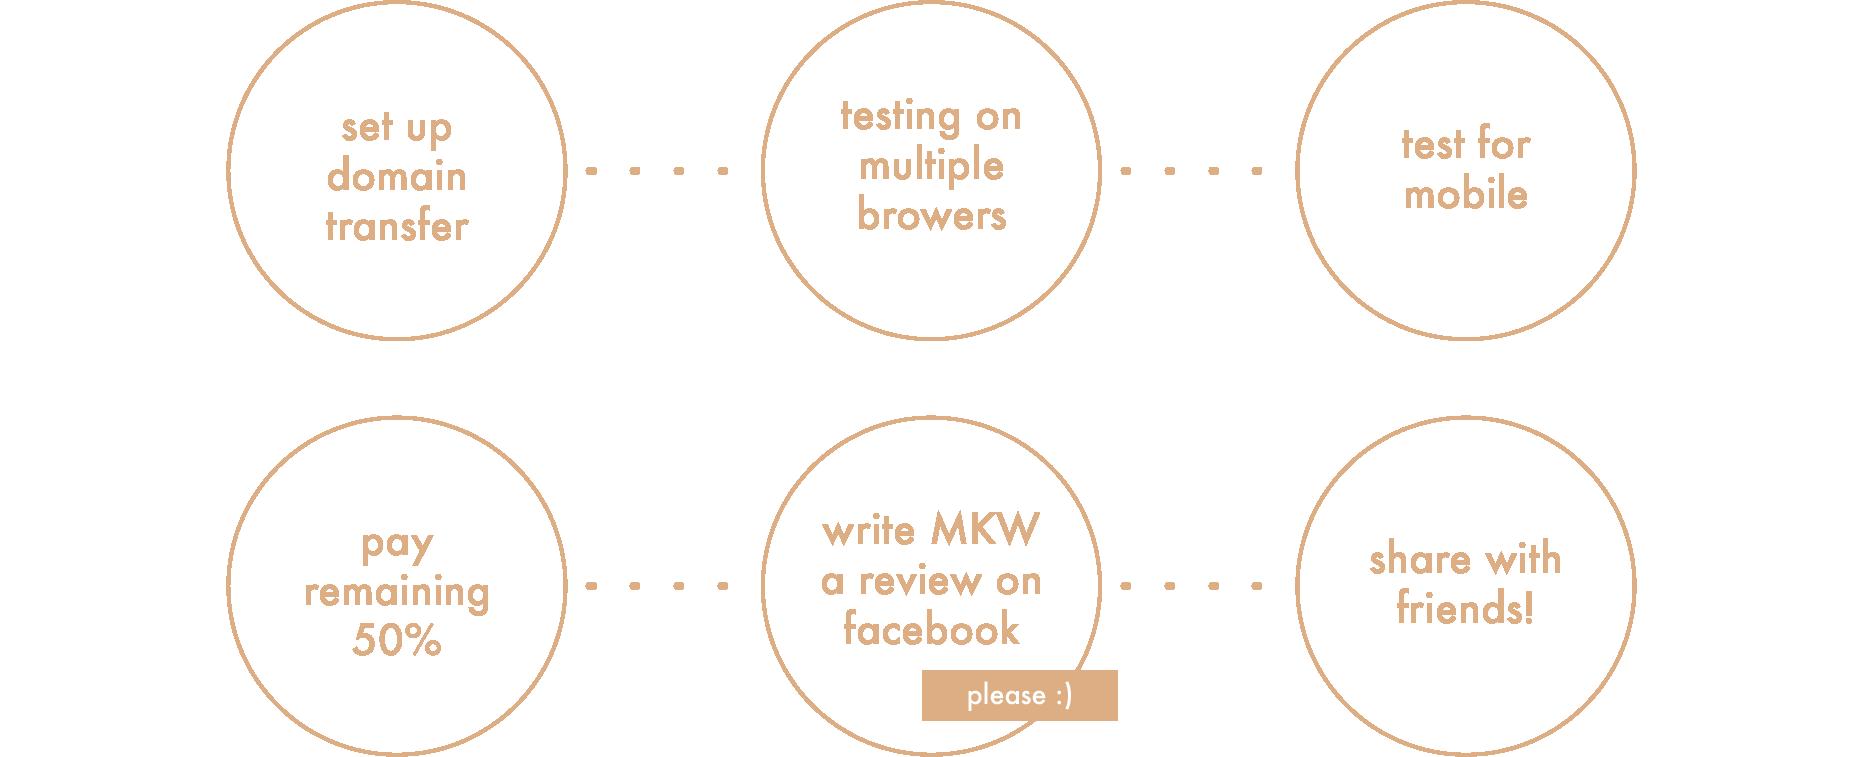 MKW_Web Design WTE-13.png